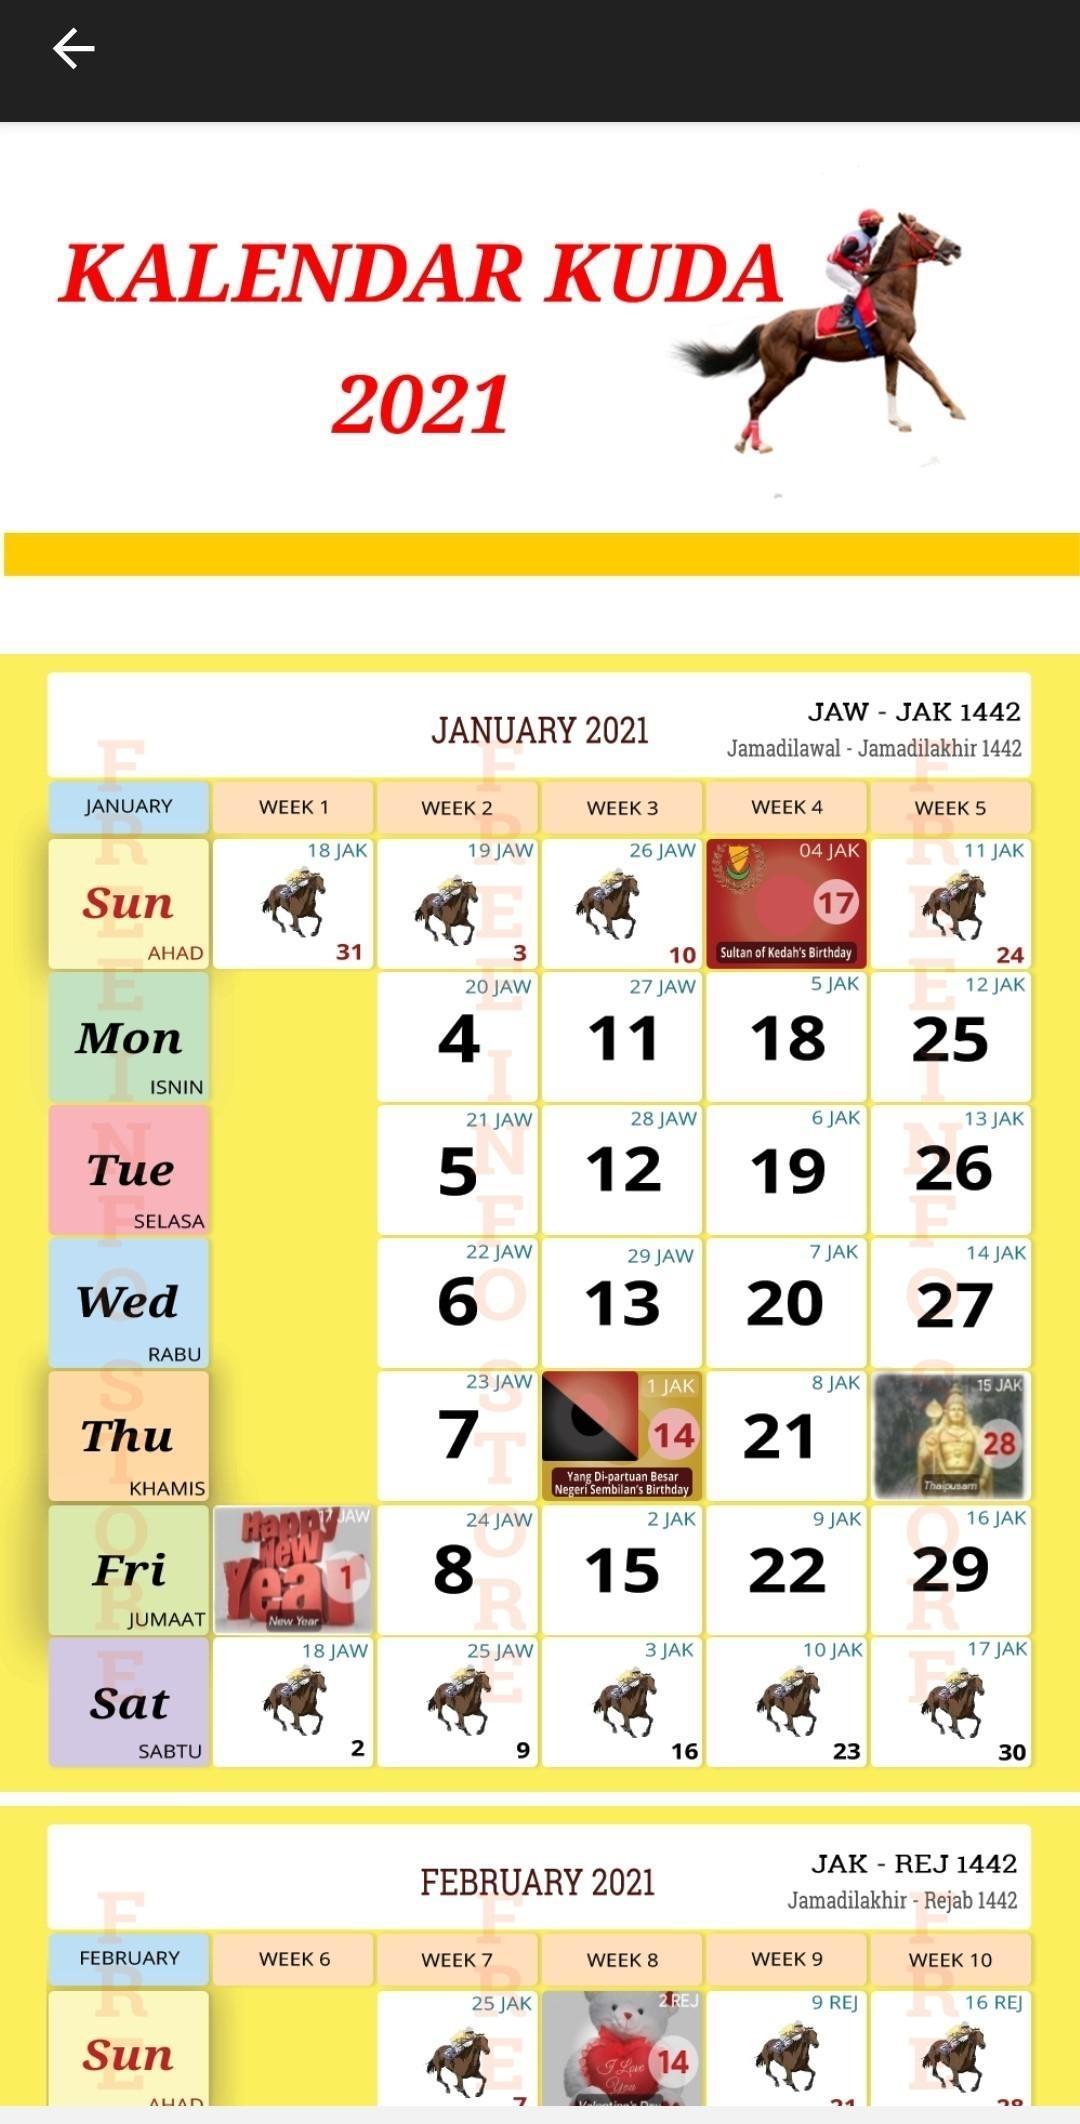 Kalendar Kuda 2021 For Android - Apk Download